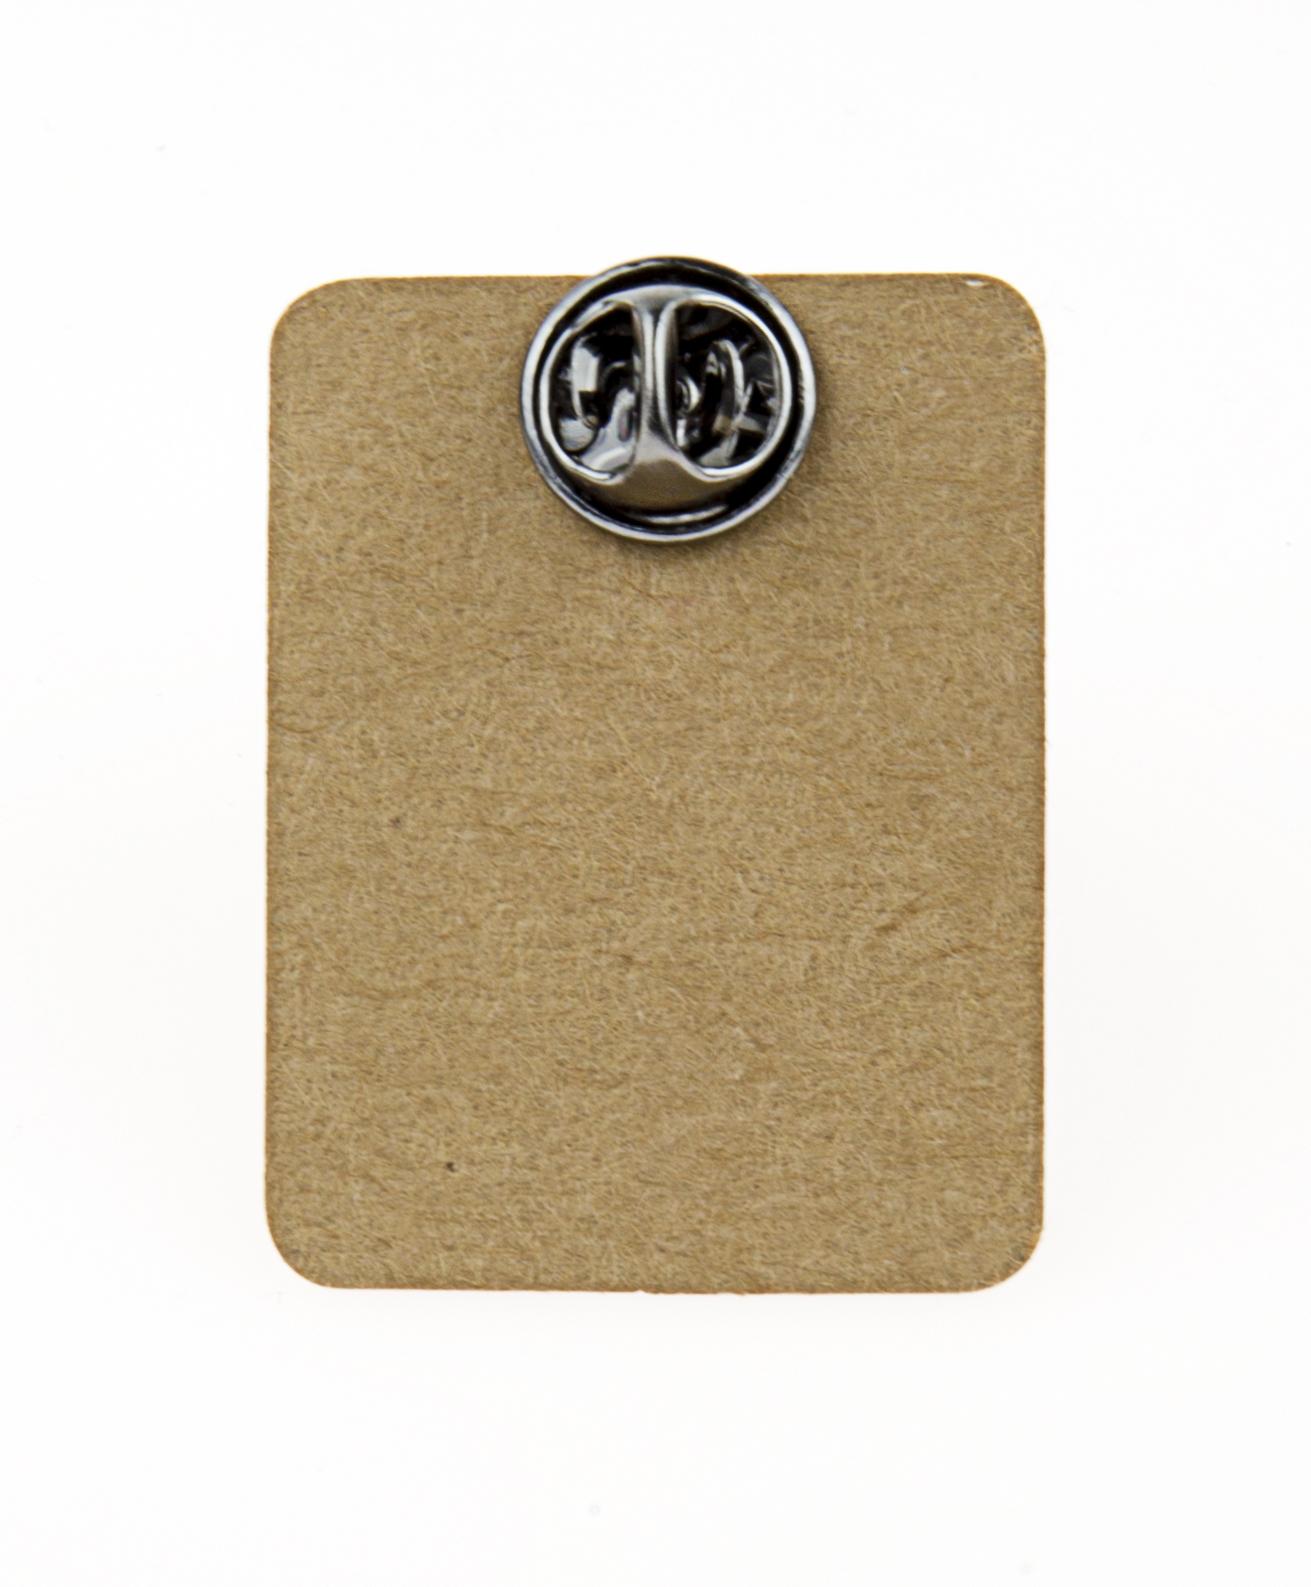 Metal Green Alien Enamel Pin Badge